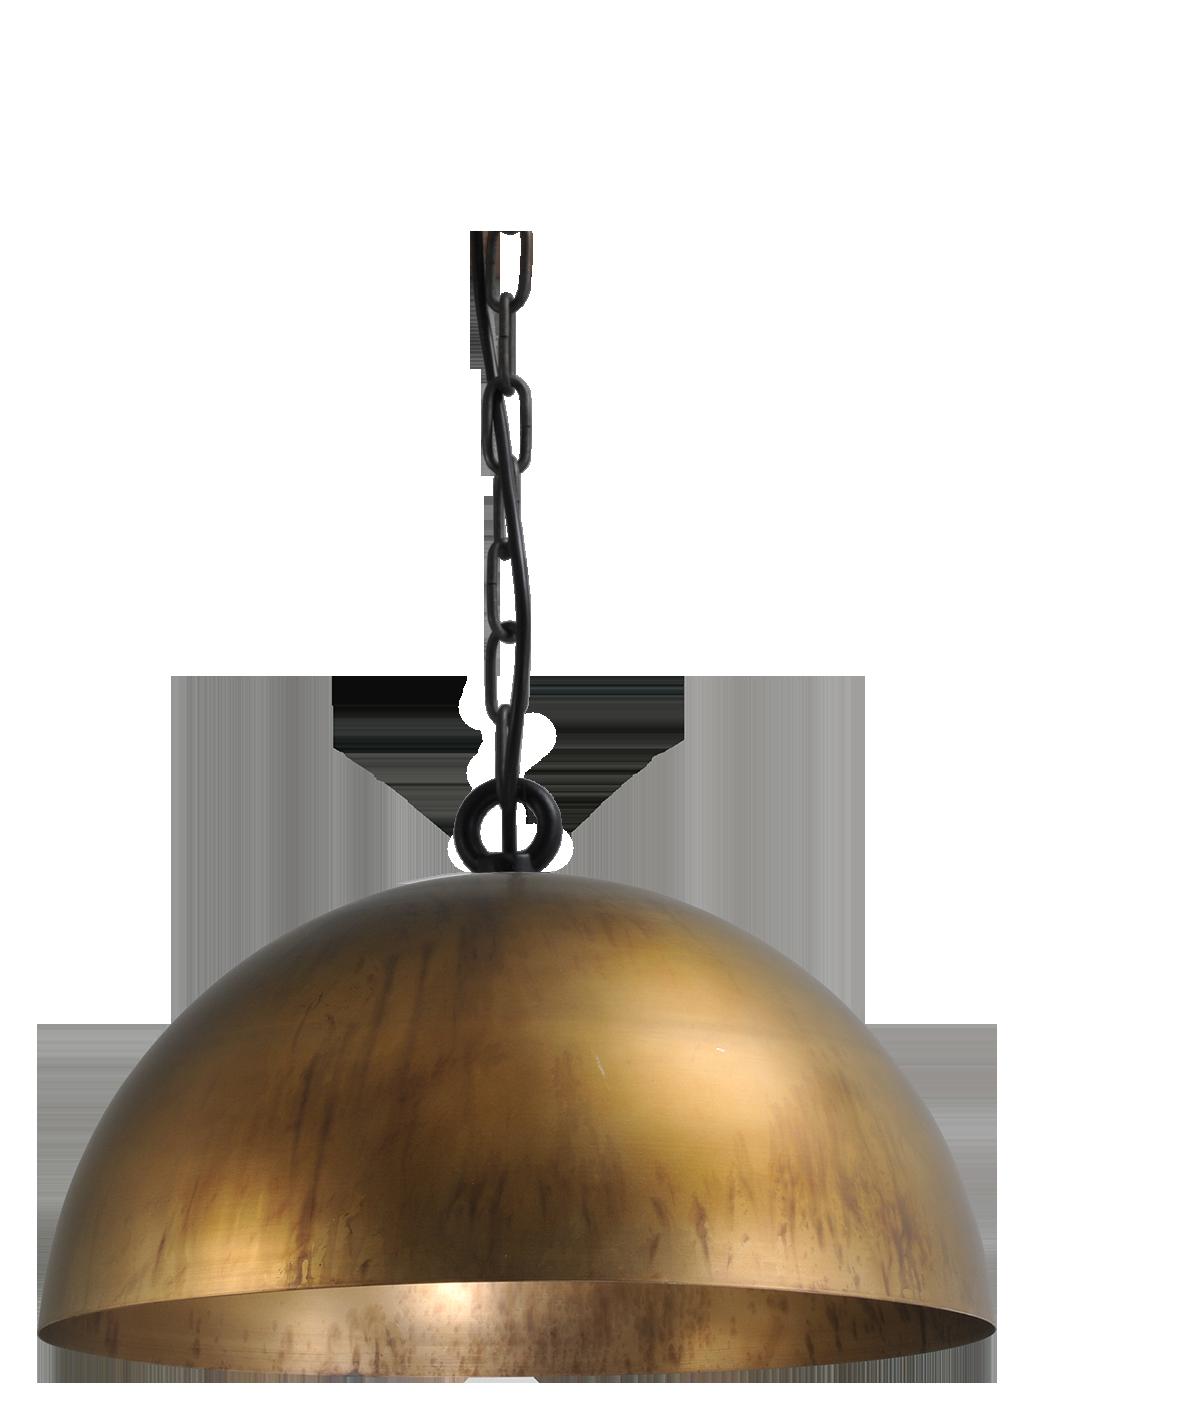 Larino Antique Brass HL LARINO Ø40CM ANTIQUE BRASS OUTSIDE